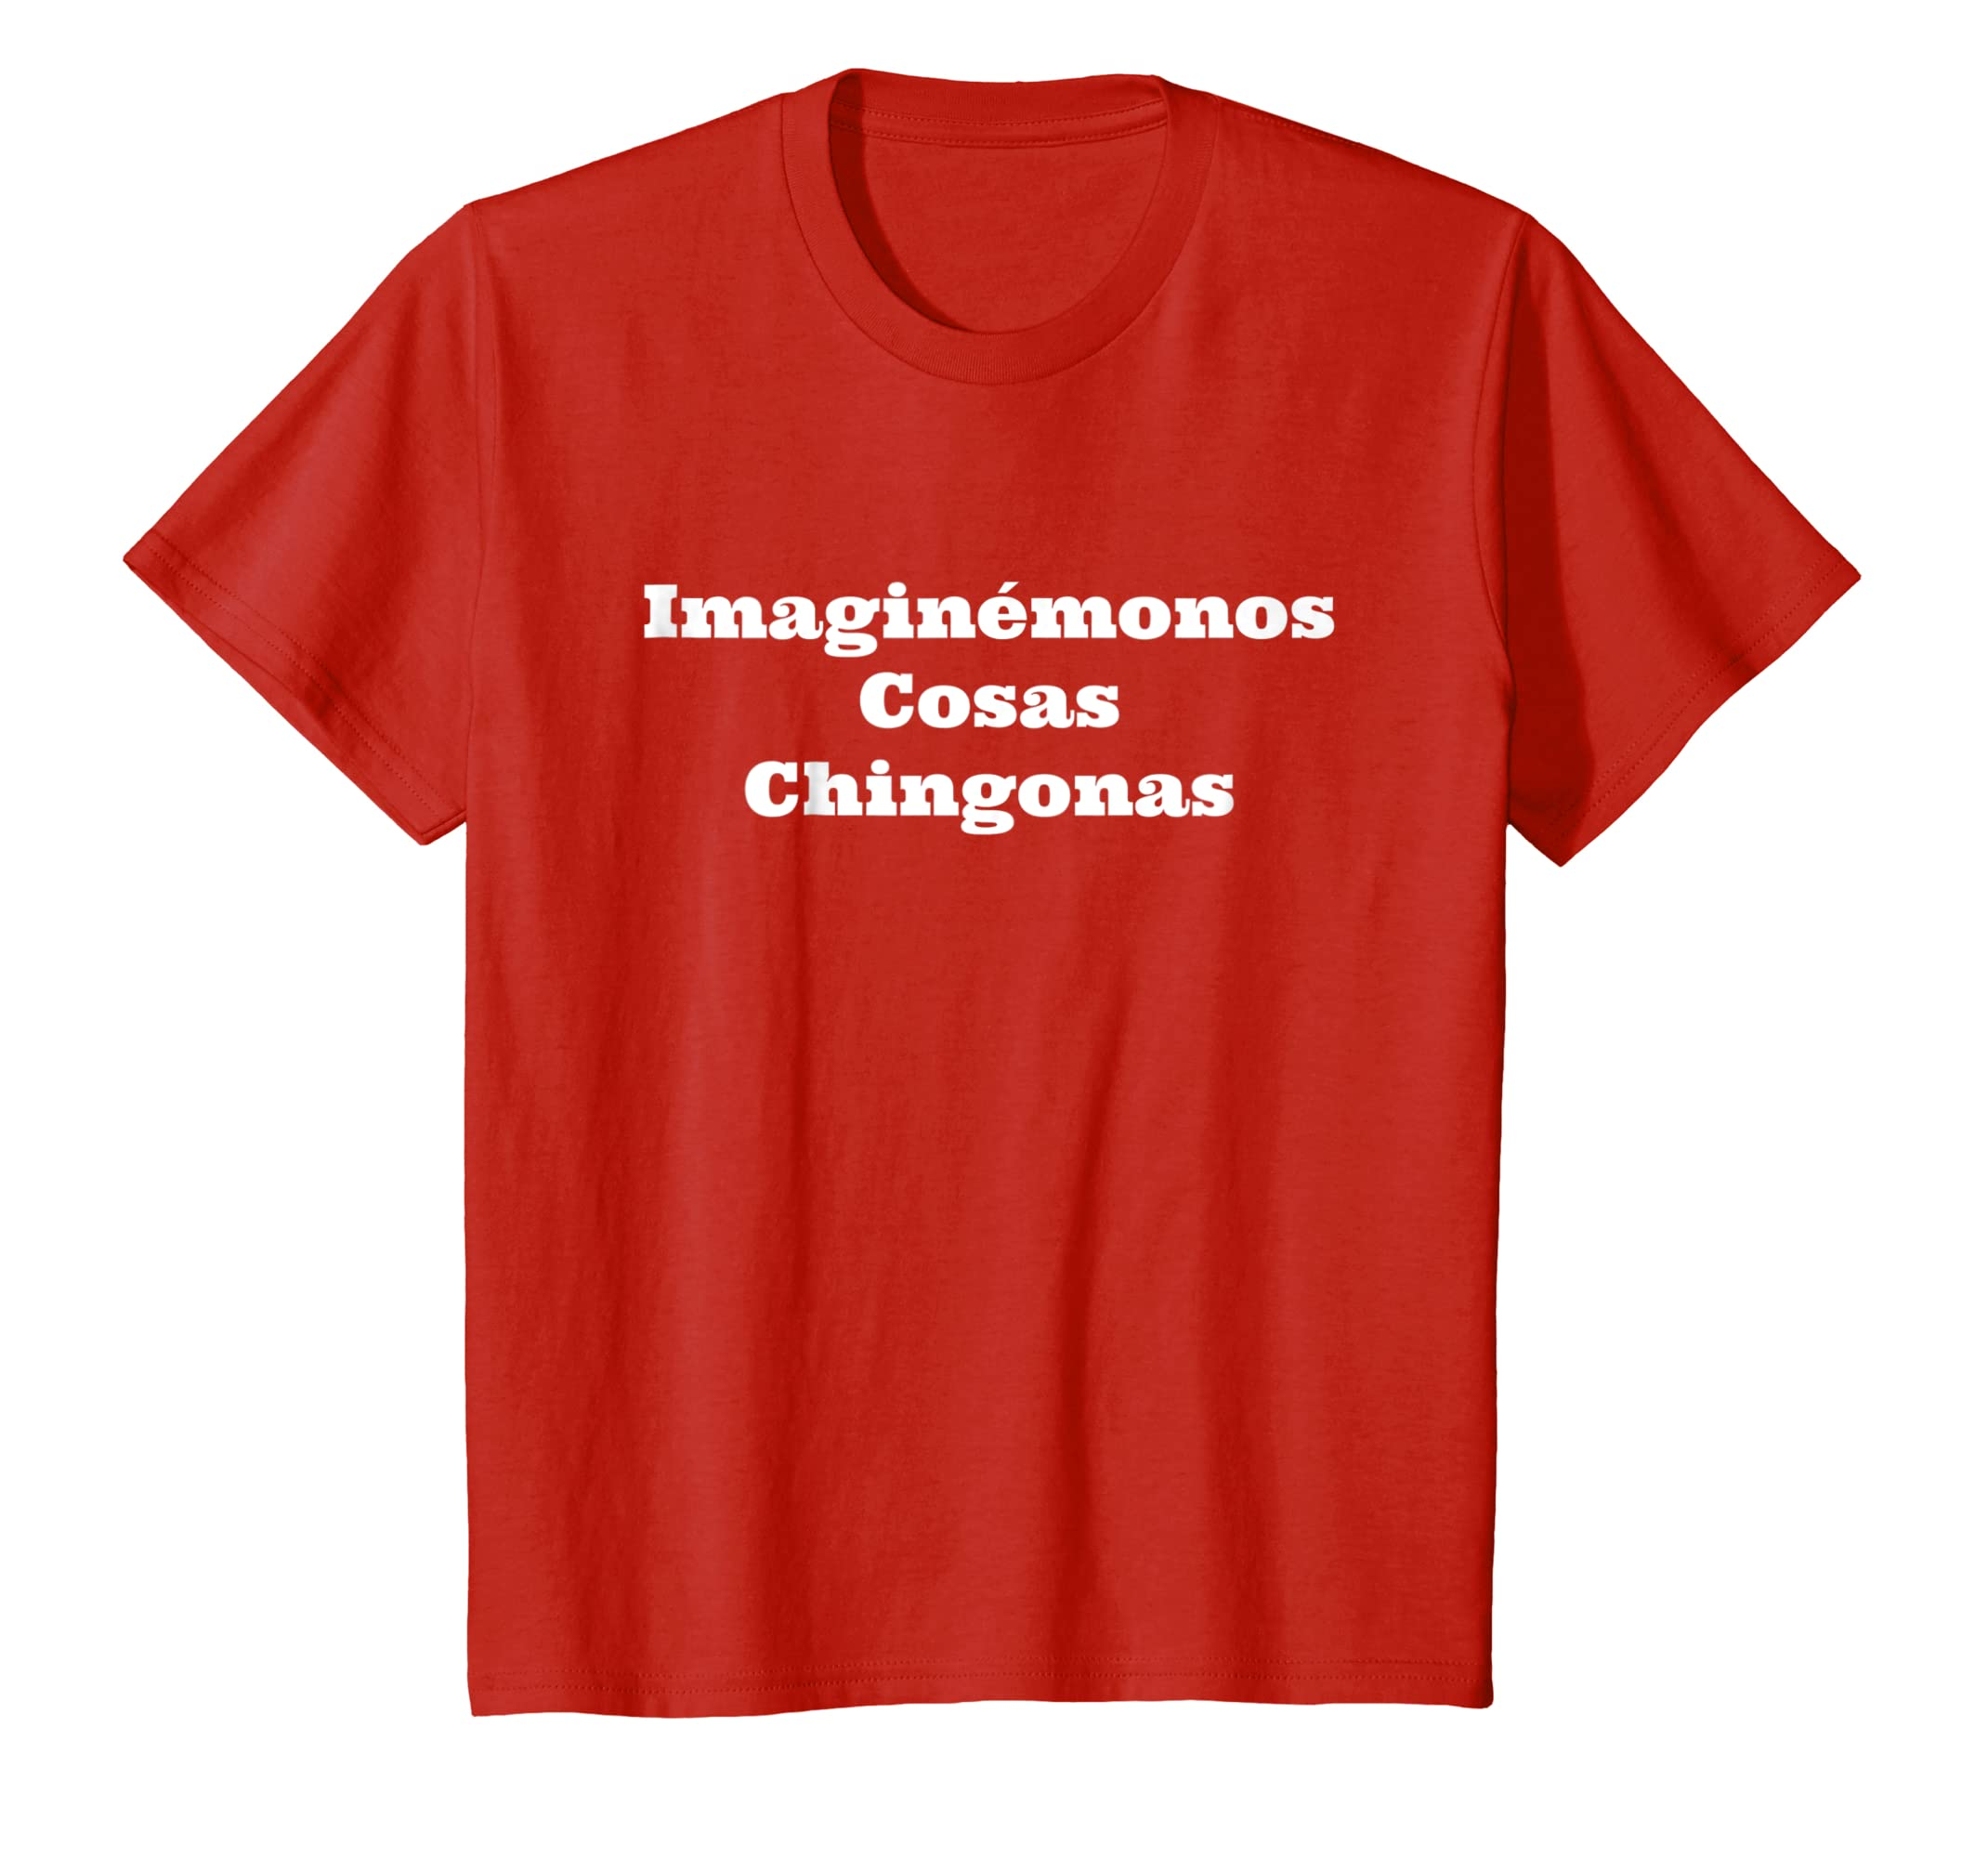 Amazon.com: Imaginemonos Cosas Chingonas - Camiseta Mexico Chistosa: Clothing